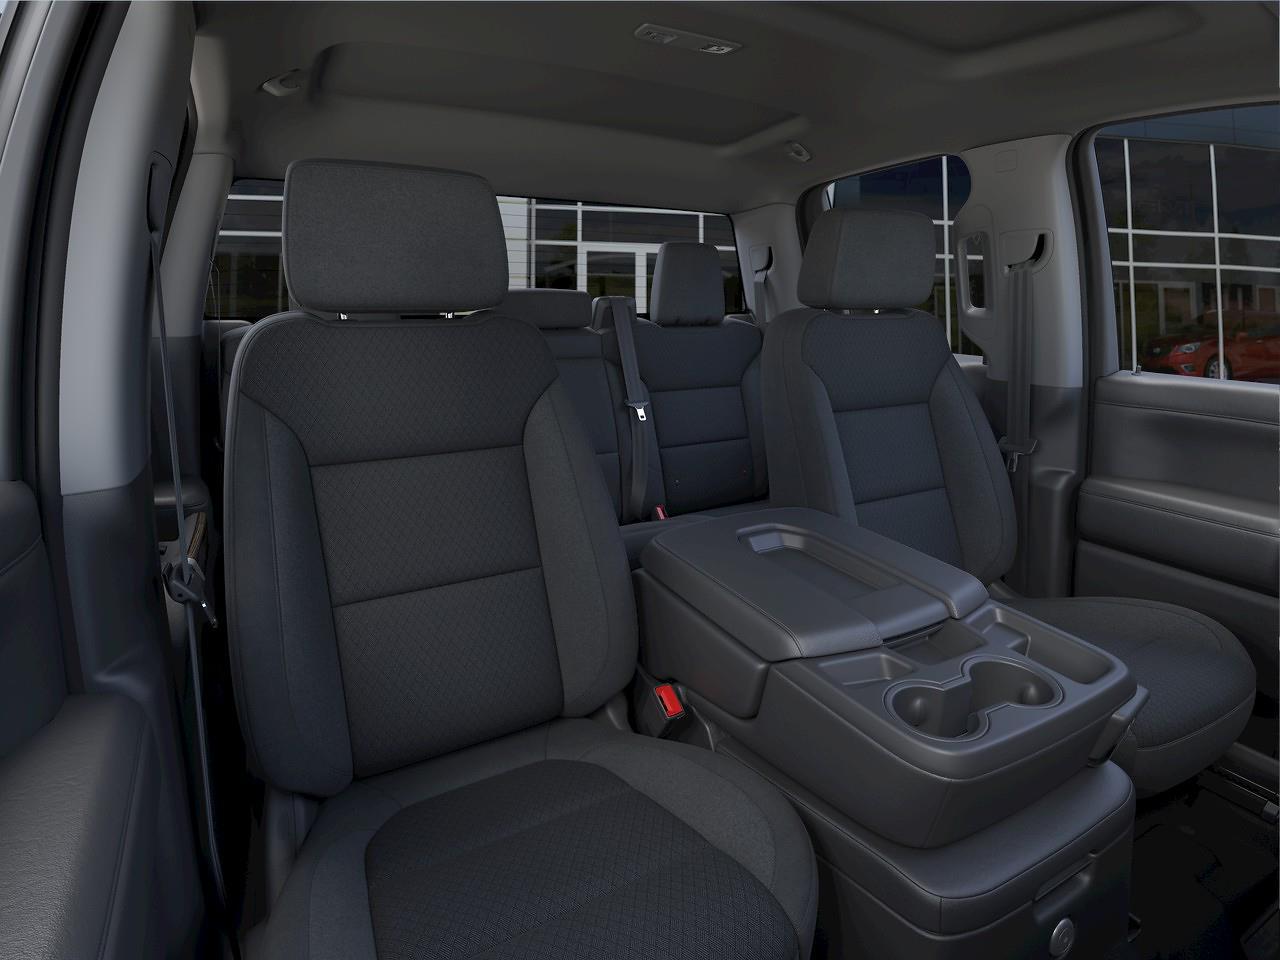 2021 GMC Sierra 1500 Double Cab 4x4, Pickup #216870 - photo 13